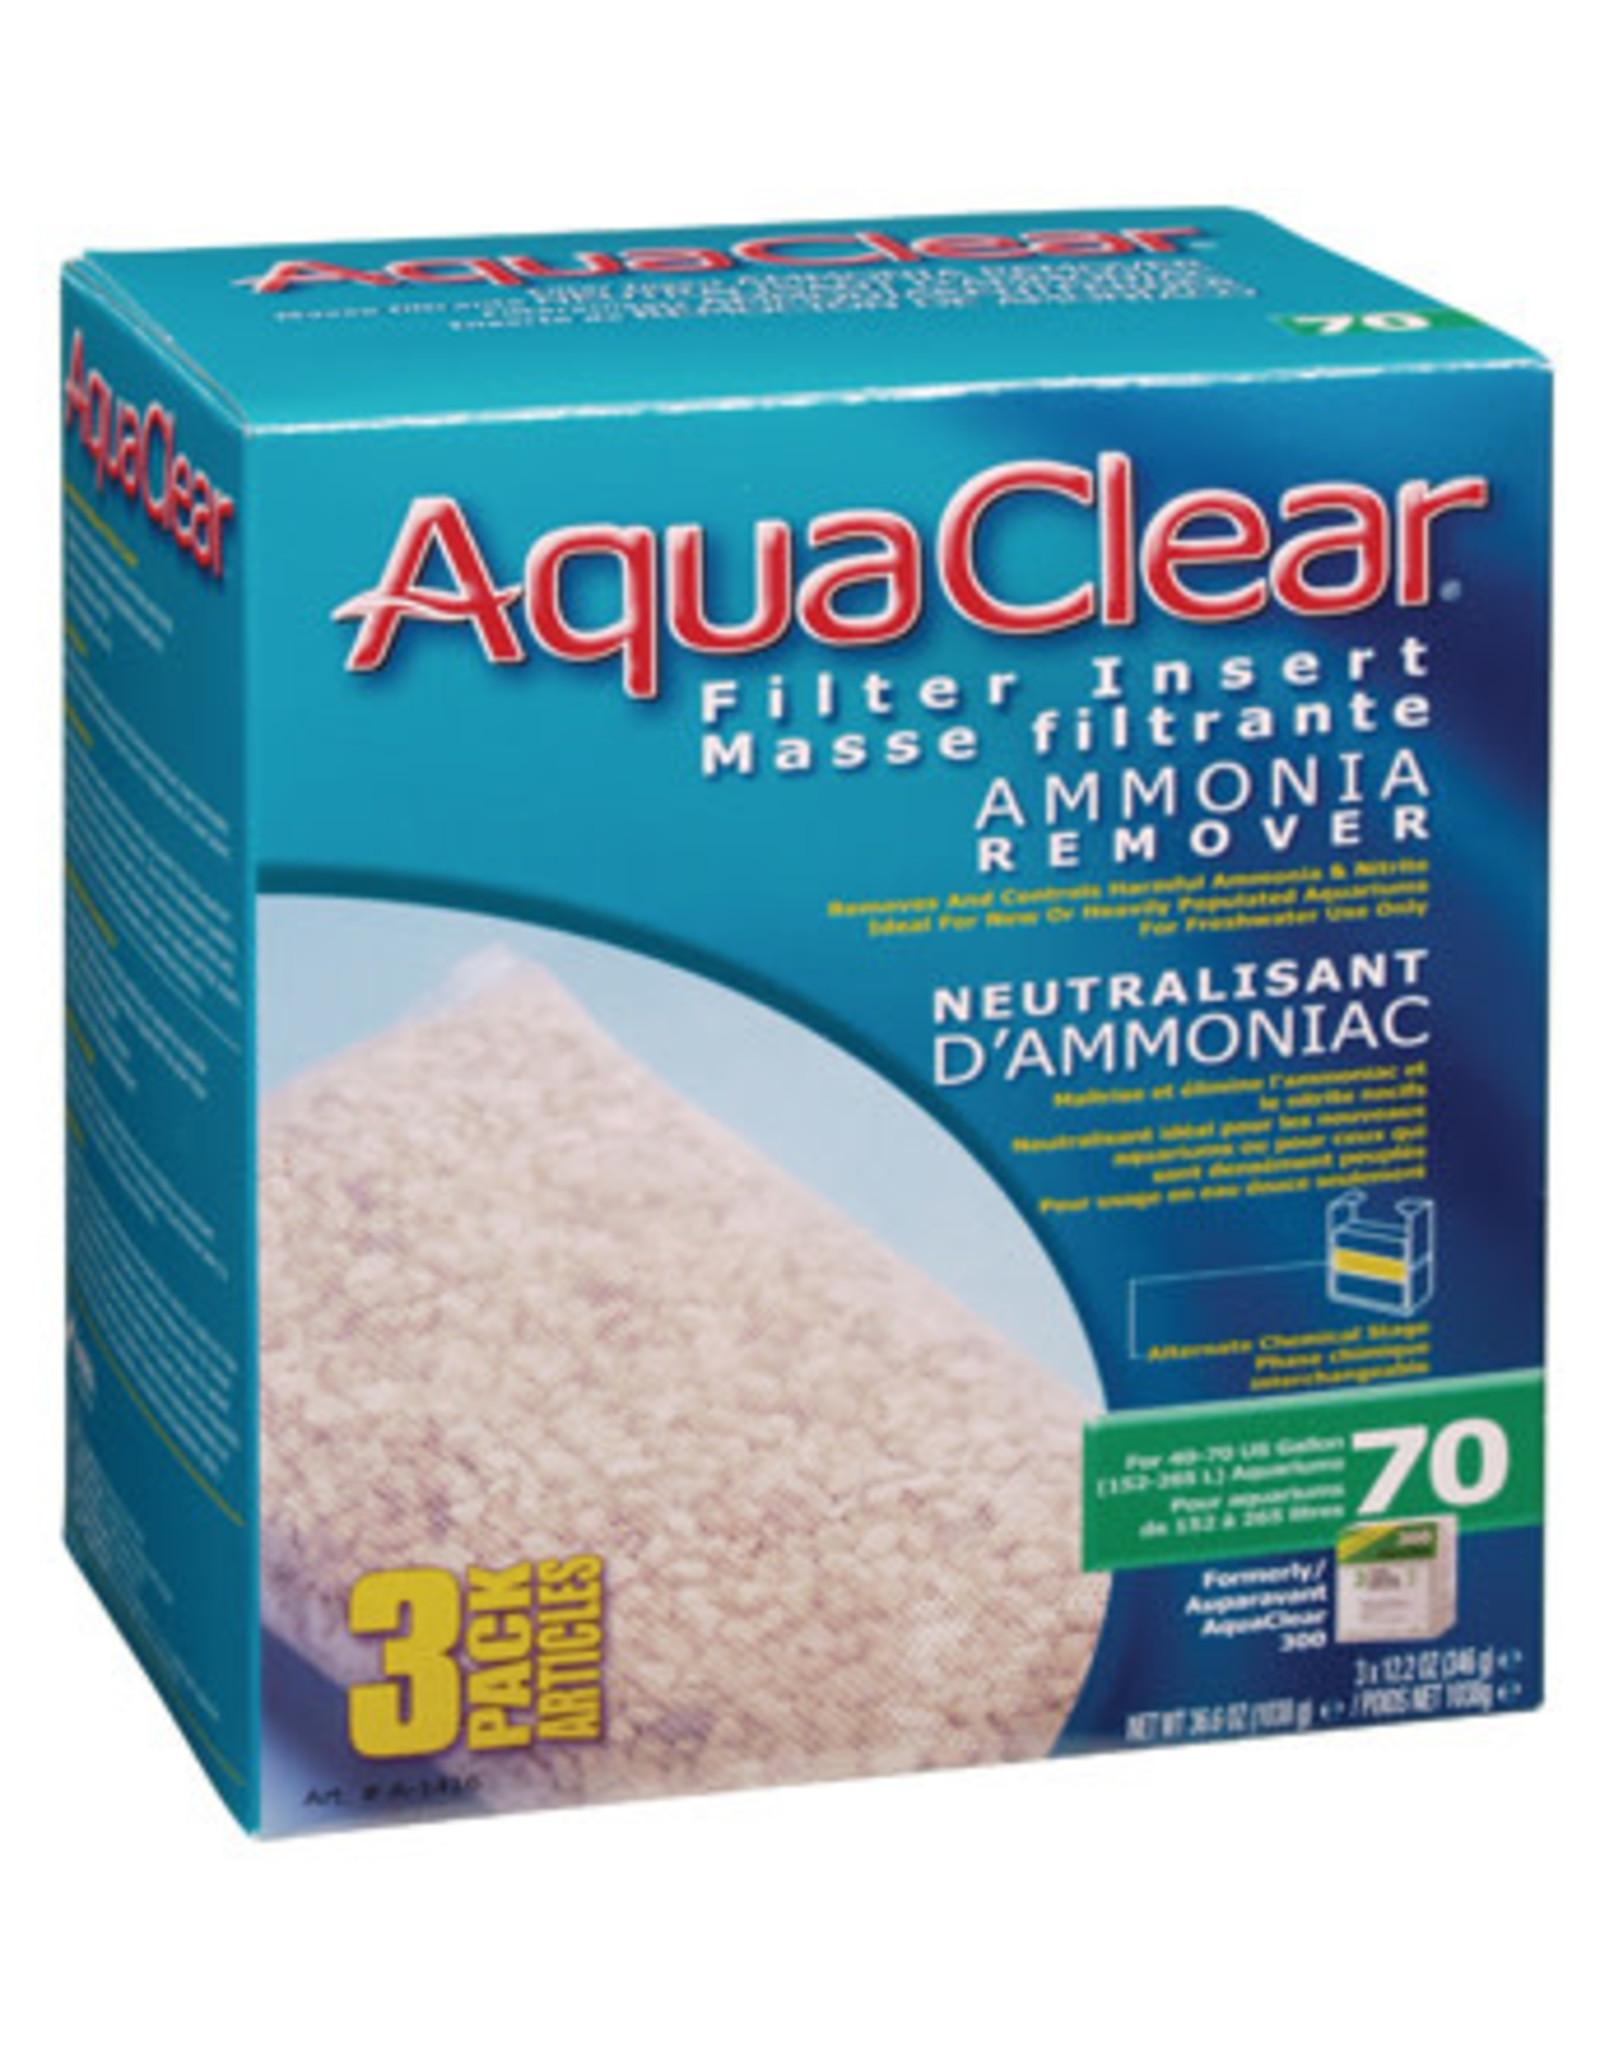 AquaClear AquaClear 70 Ammonia Remover Filter Insert 3 pack 1038g